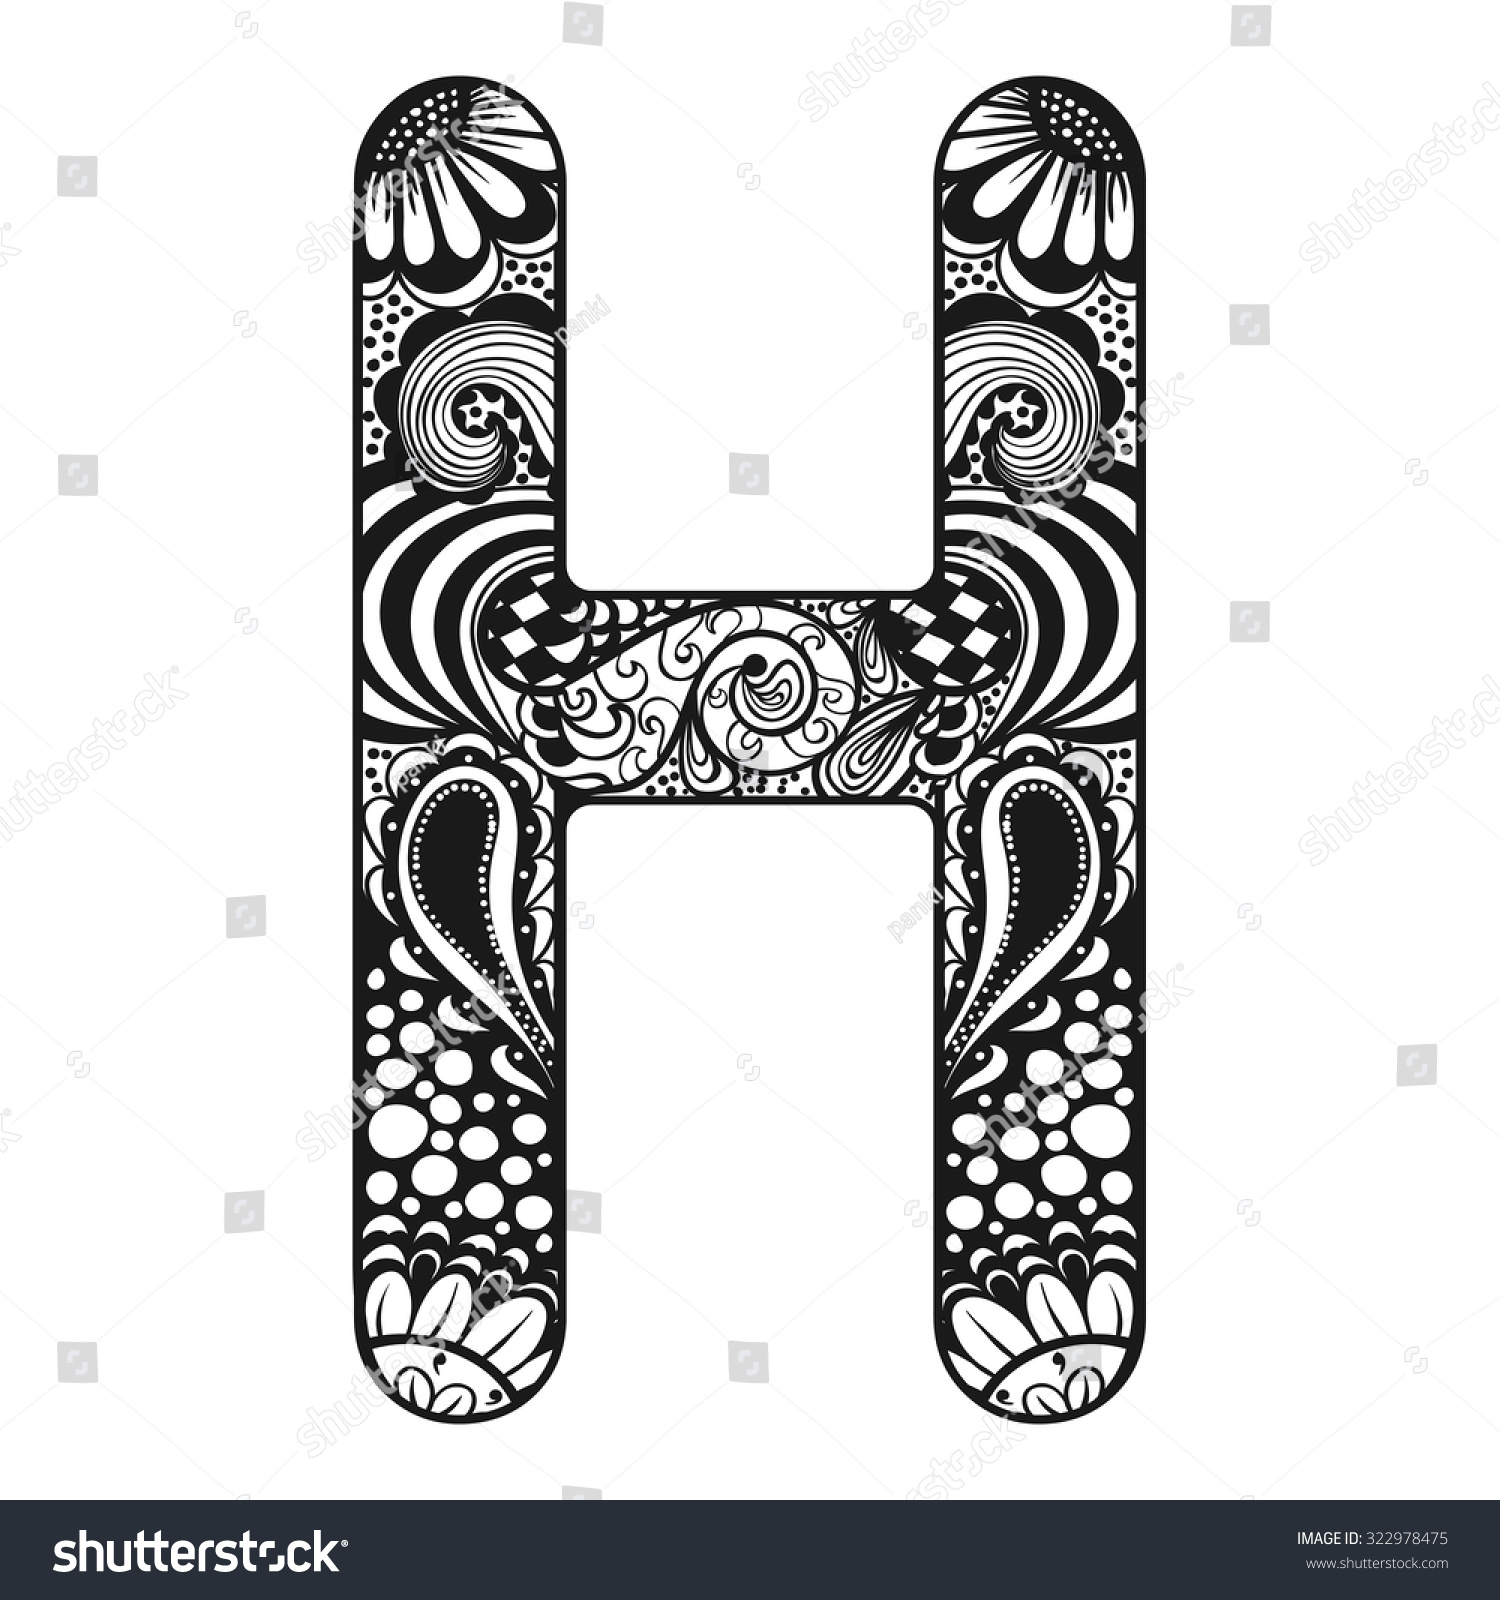 Zentangle Stylized Alphabet Lace